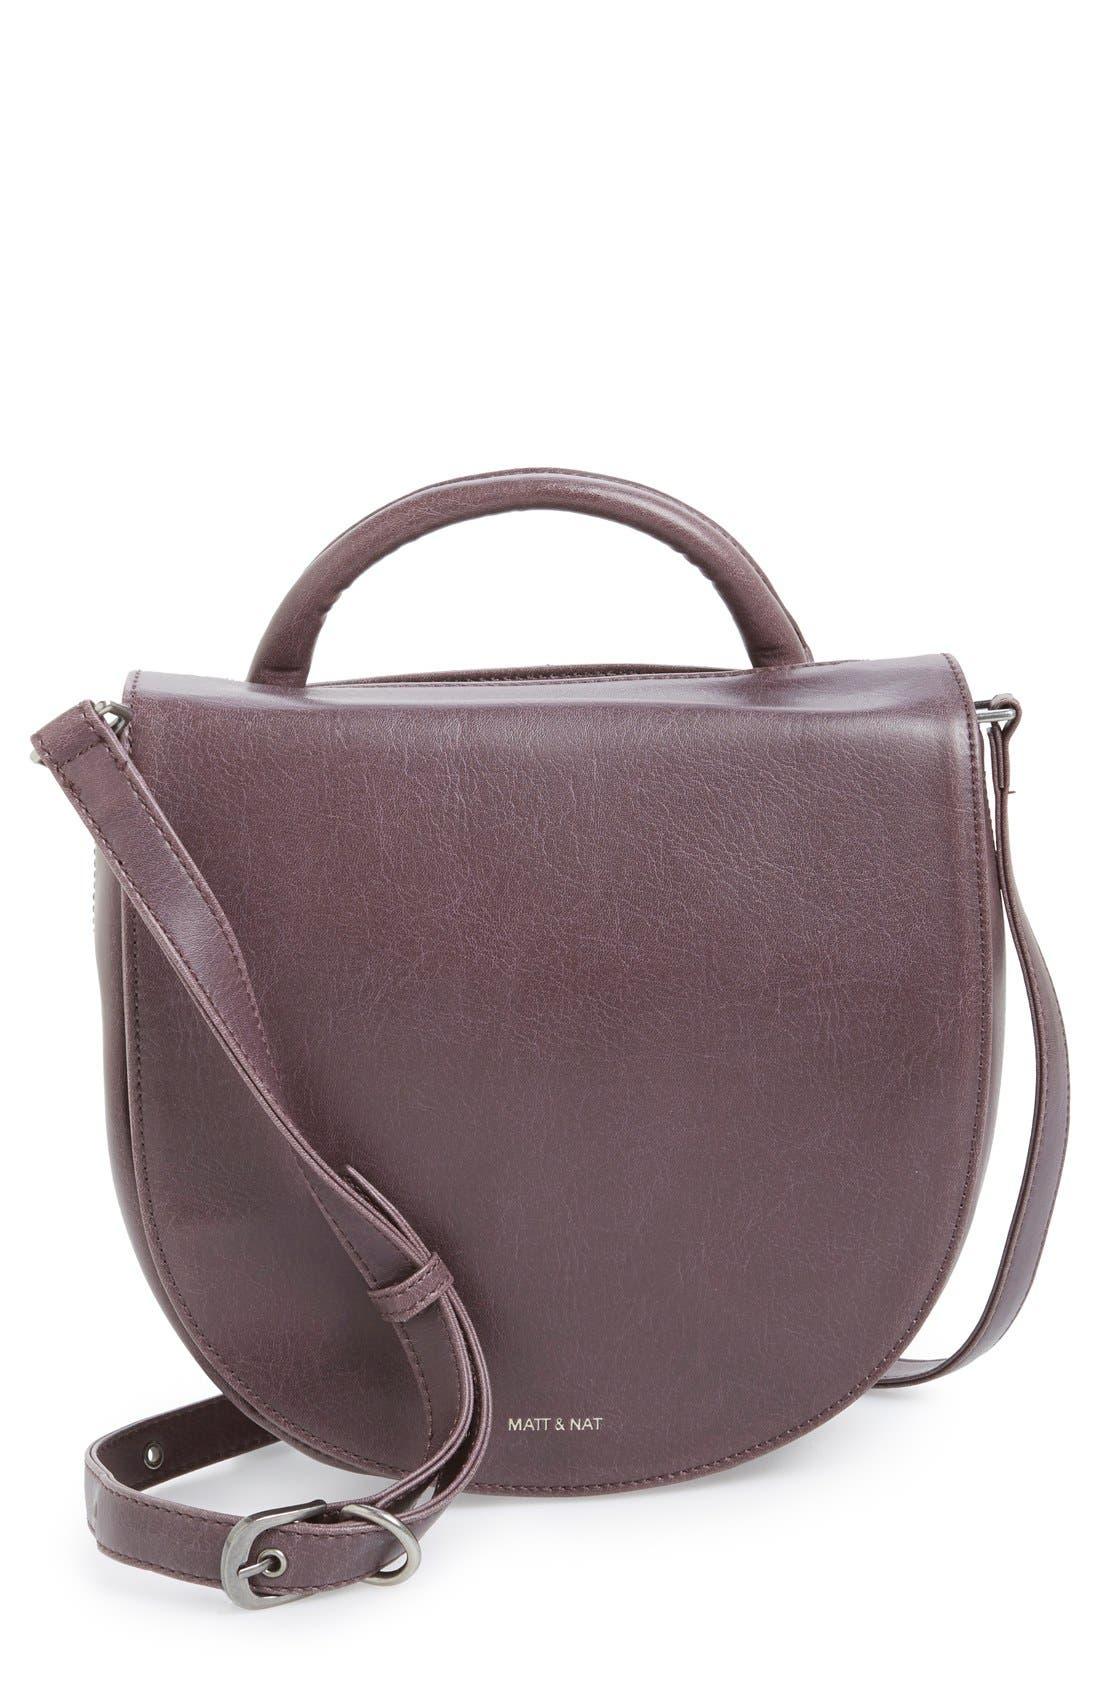 Main Image - Matt & Nat 'Parabole' Vegan Leather Crossbody Bag